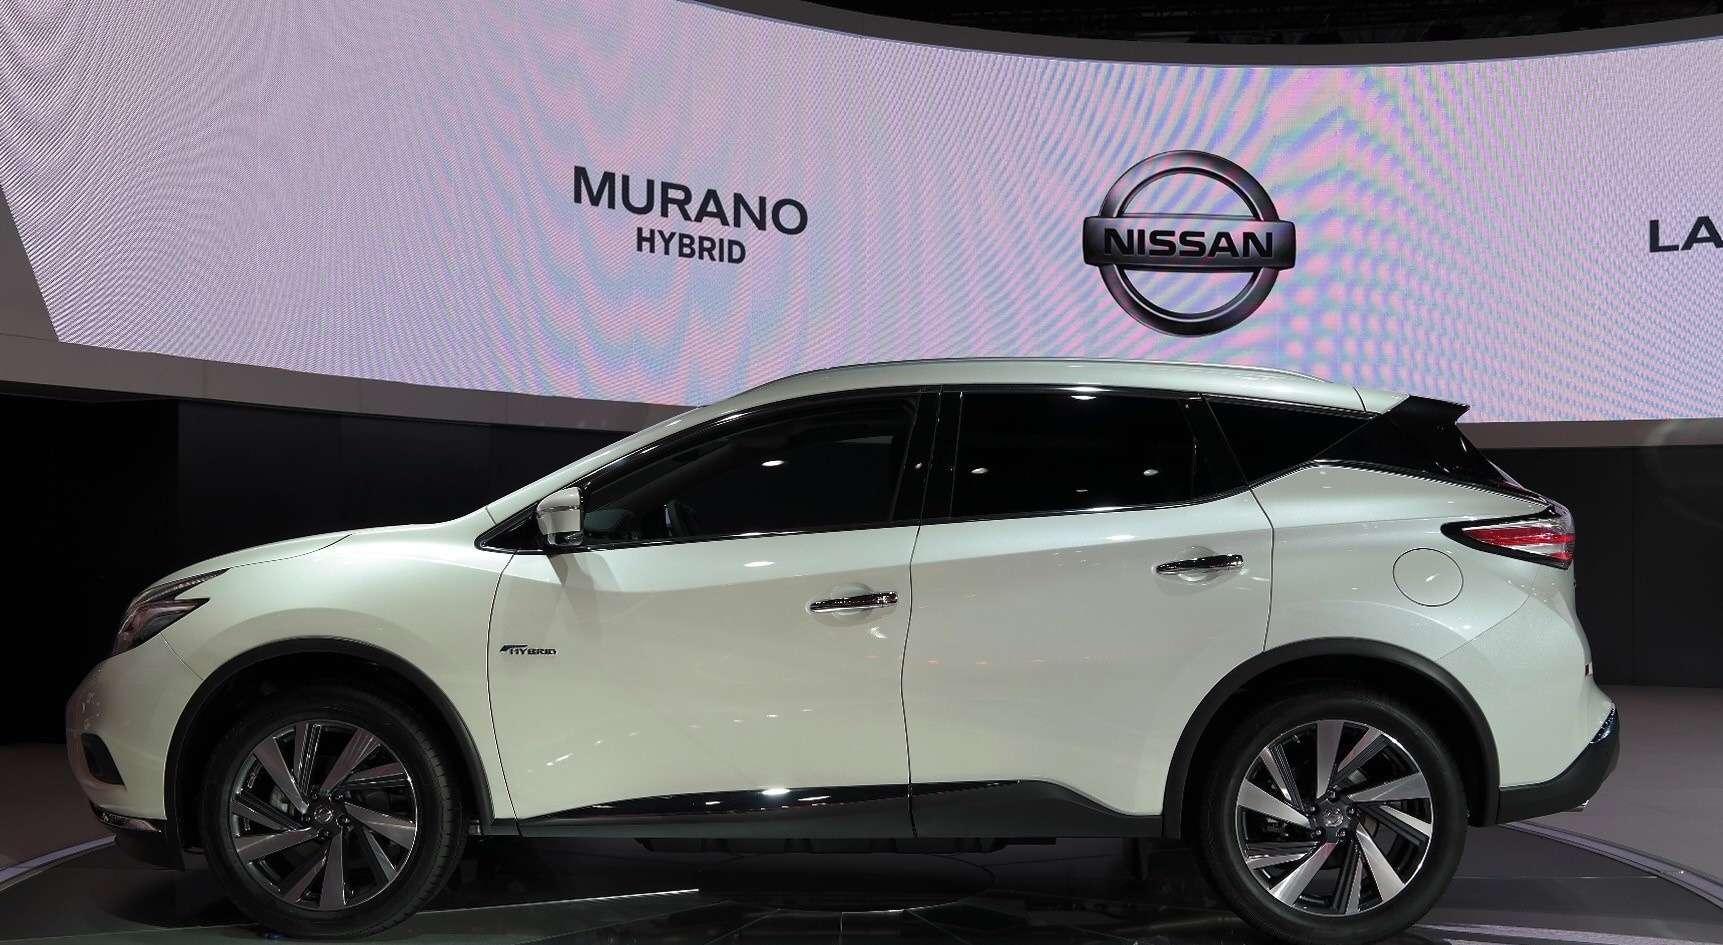 world-premiere-for-2016-nissan-murano-hybrid-at-auto-shanghai-2015-live-photos_18